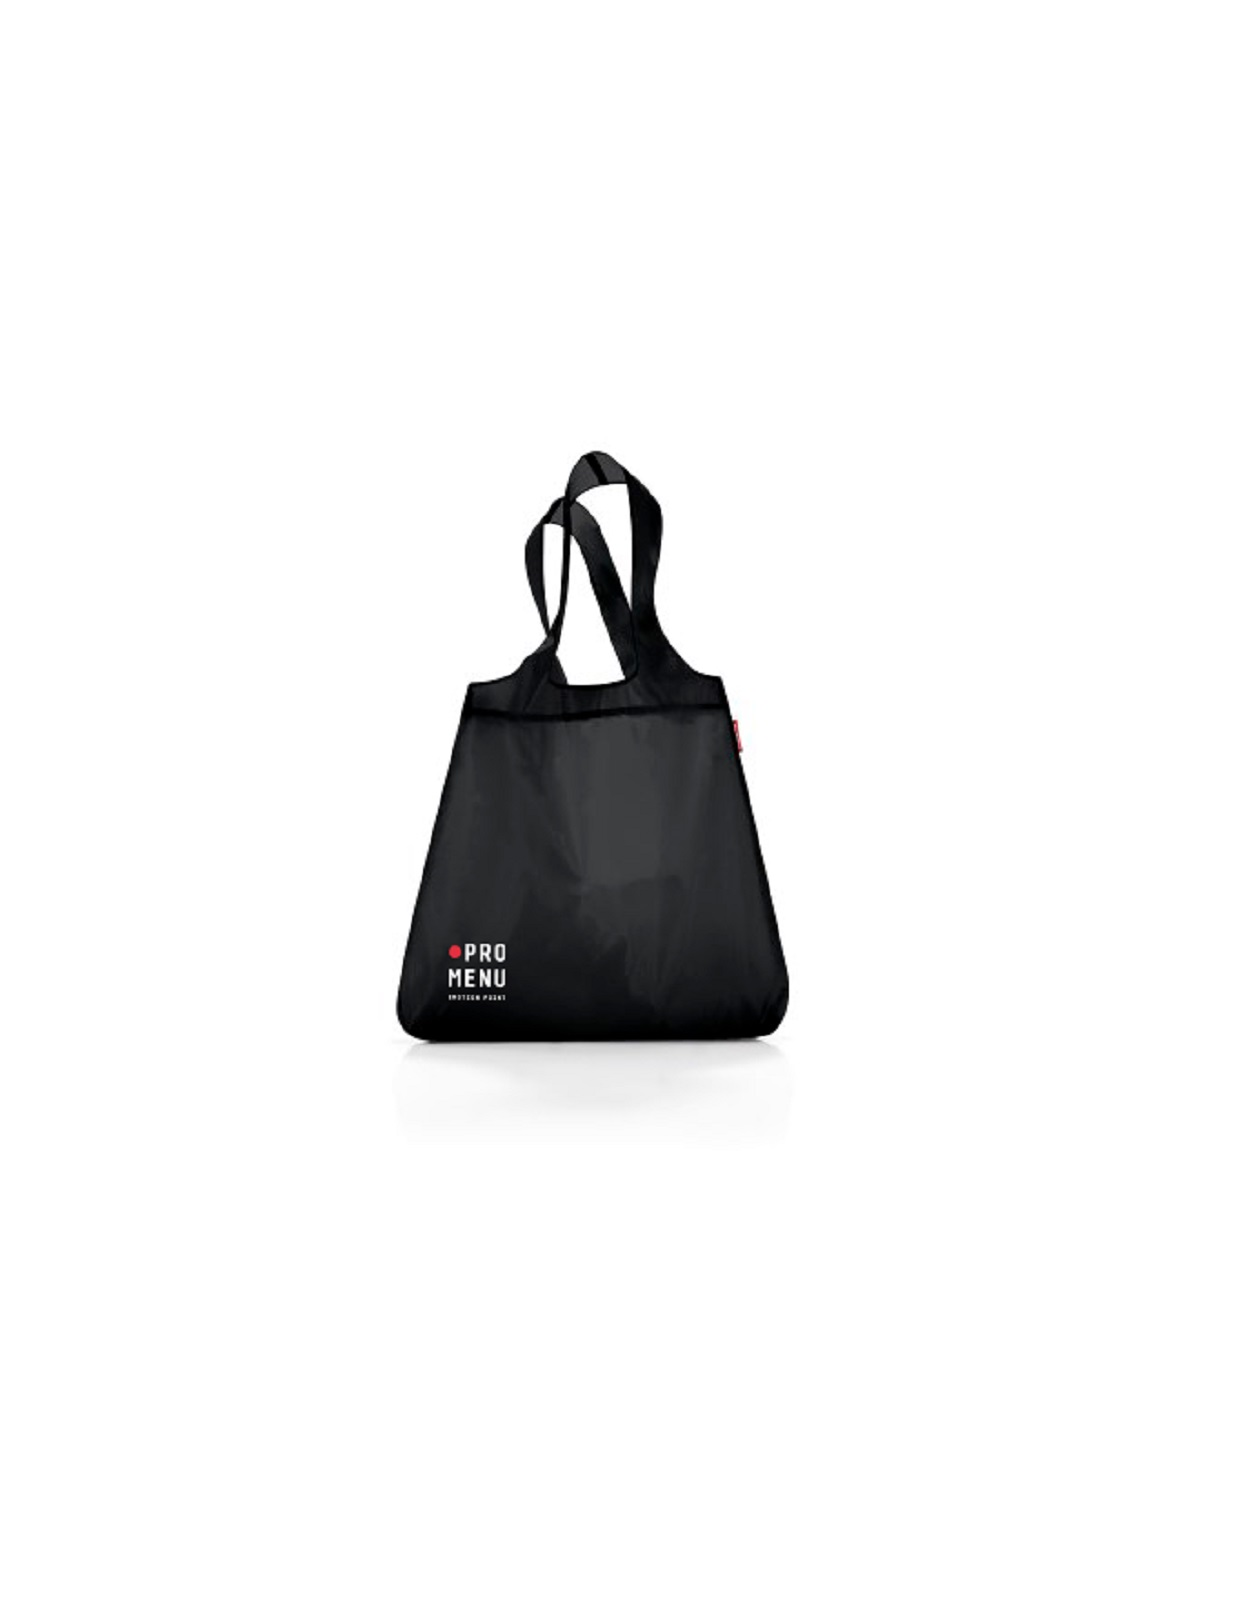 Сумка для шоппинга с лого Promenu Reisenthel Mini maxi shopper collection, 43,5 х 63 х 6 cм, цвет в ассортименте Reisenthel AT 0002LOGO фото 1